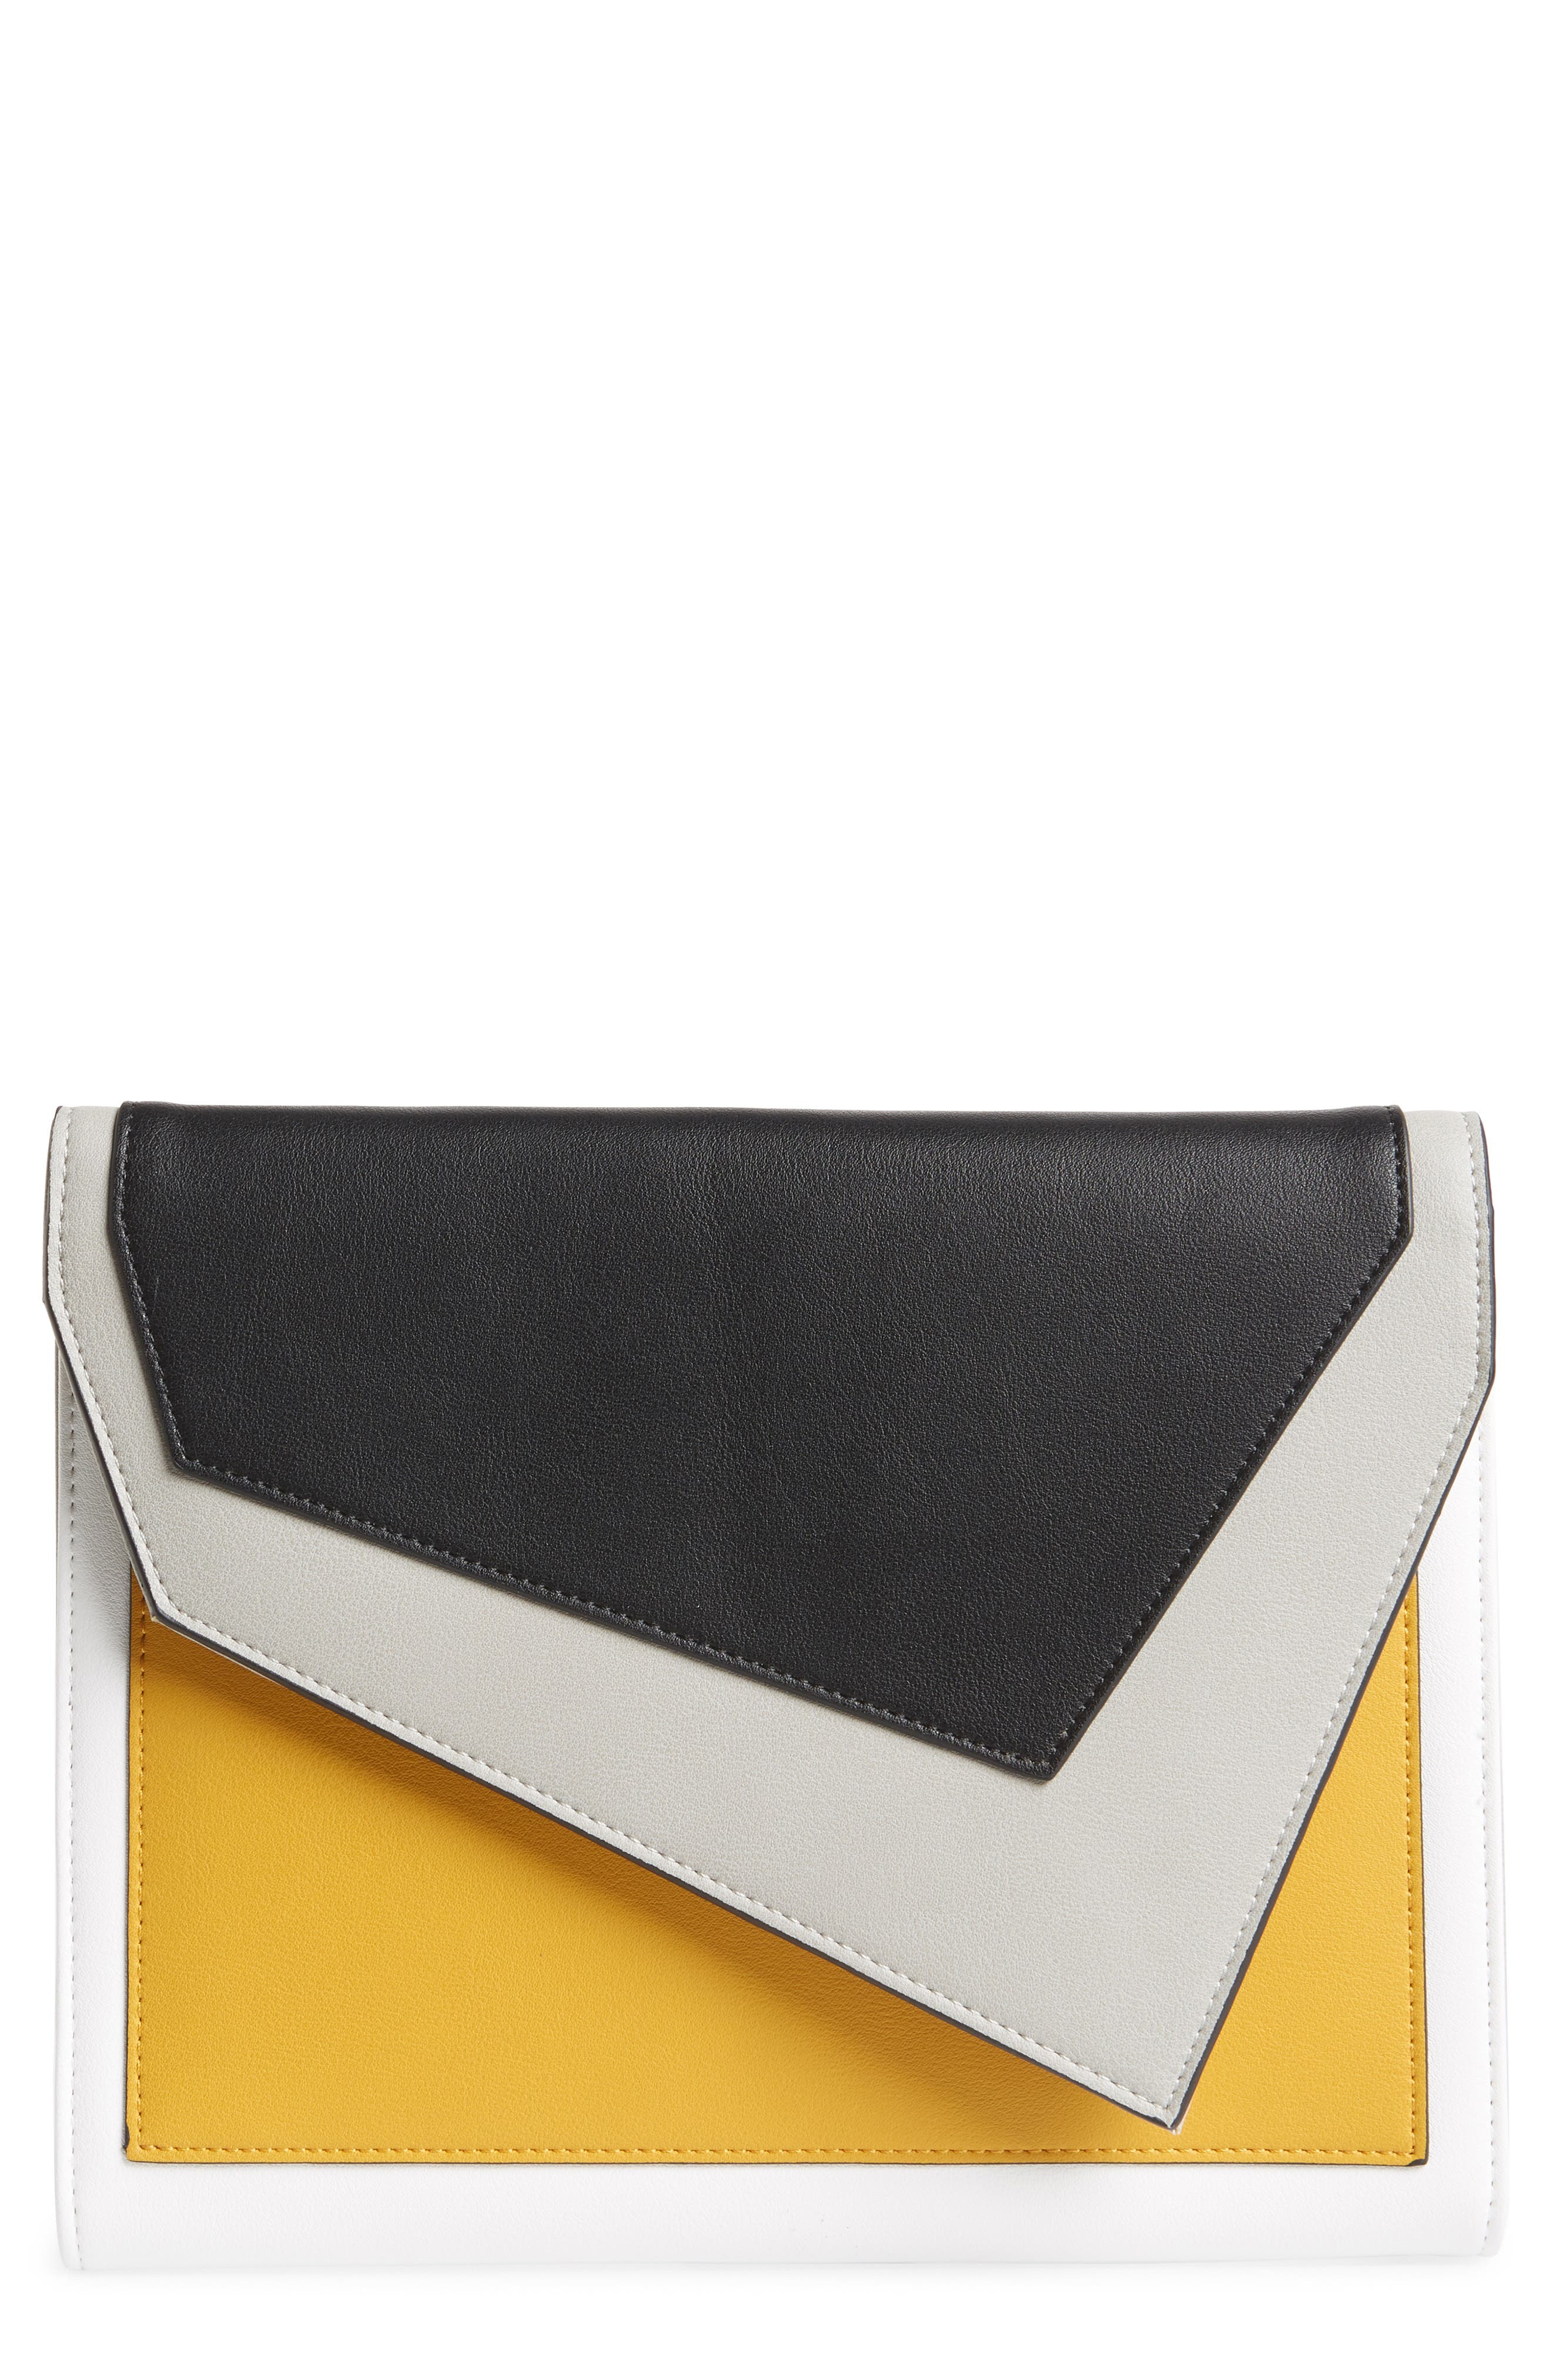 Colorblock Faux Leather Envelope Clutch,                             Main thumbnail 1, color,                             YELLOW MULTI